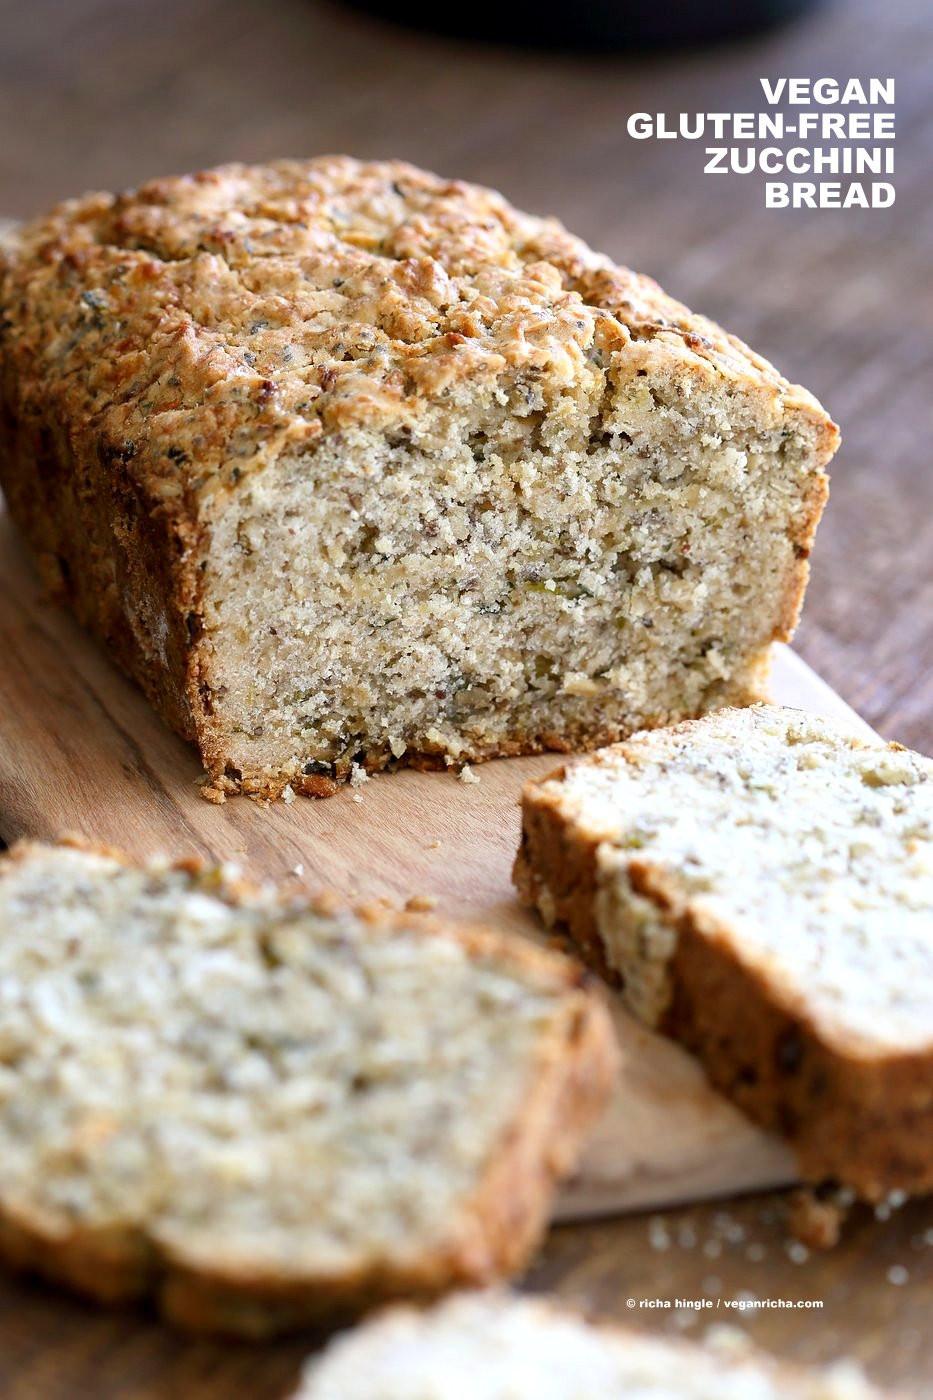 Which Bread Is Vegan  Vegan Gluten free Zucchini Bread Recipe Vegan Richa